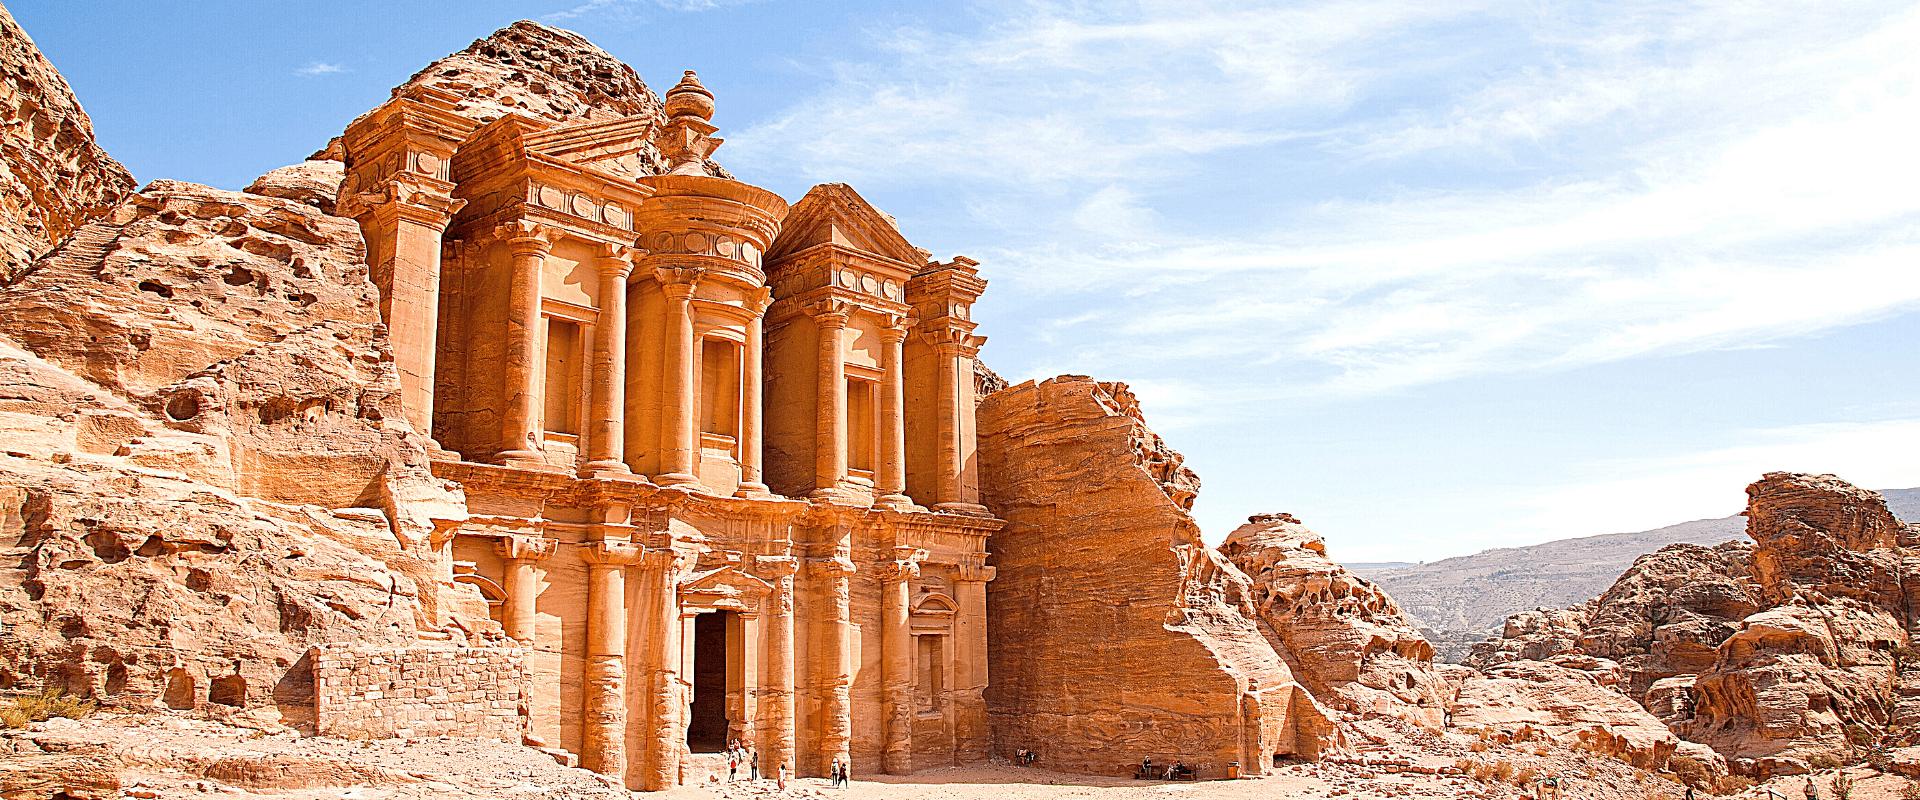 Israel and Jordan Group Tour